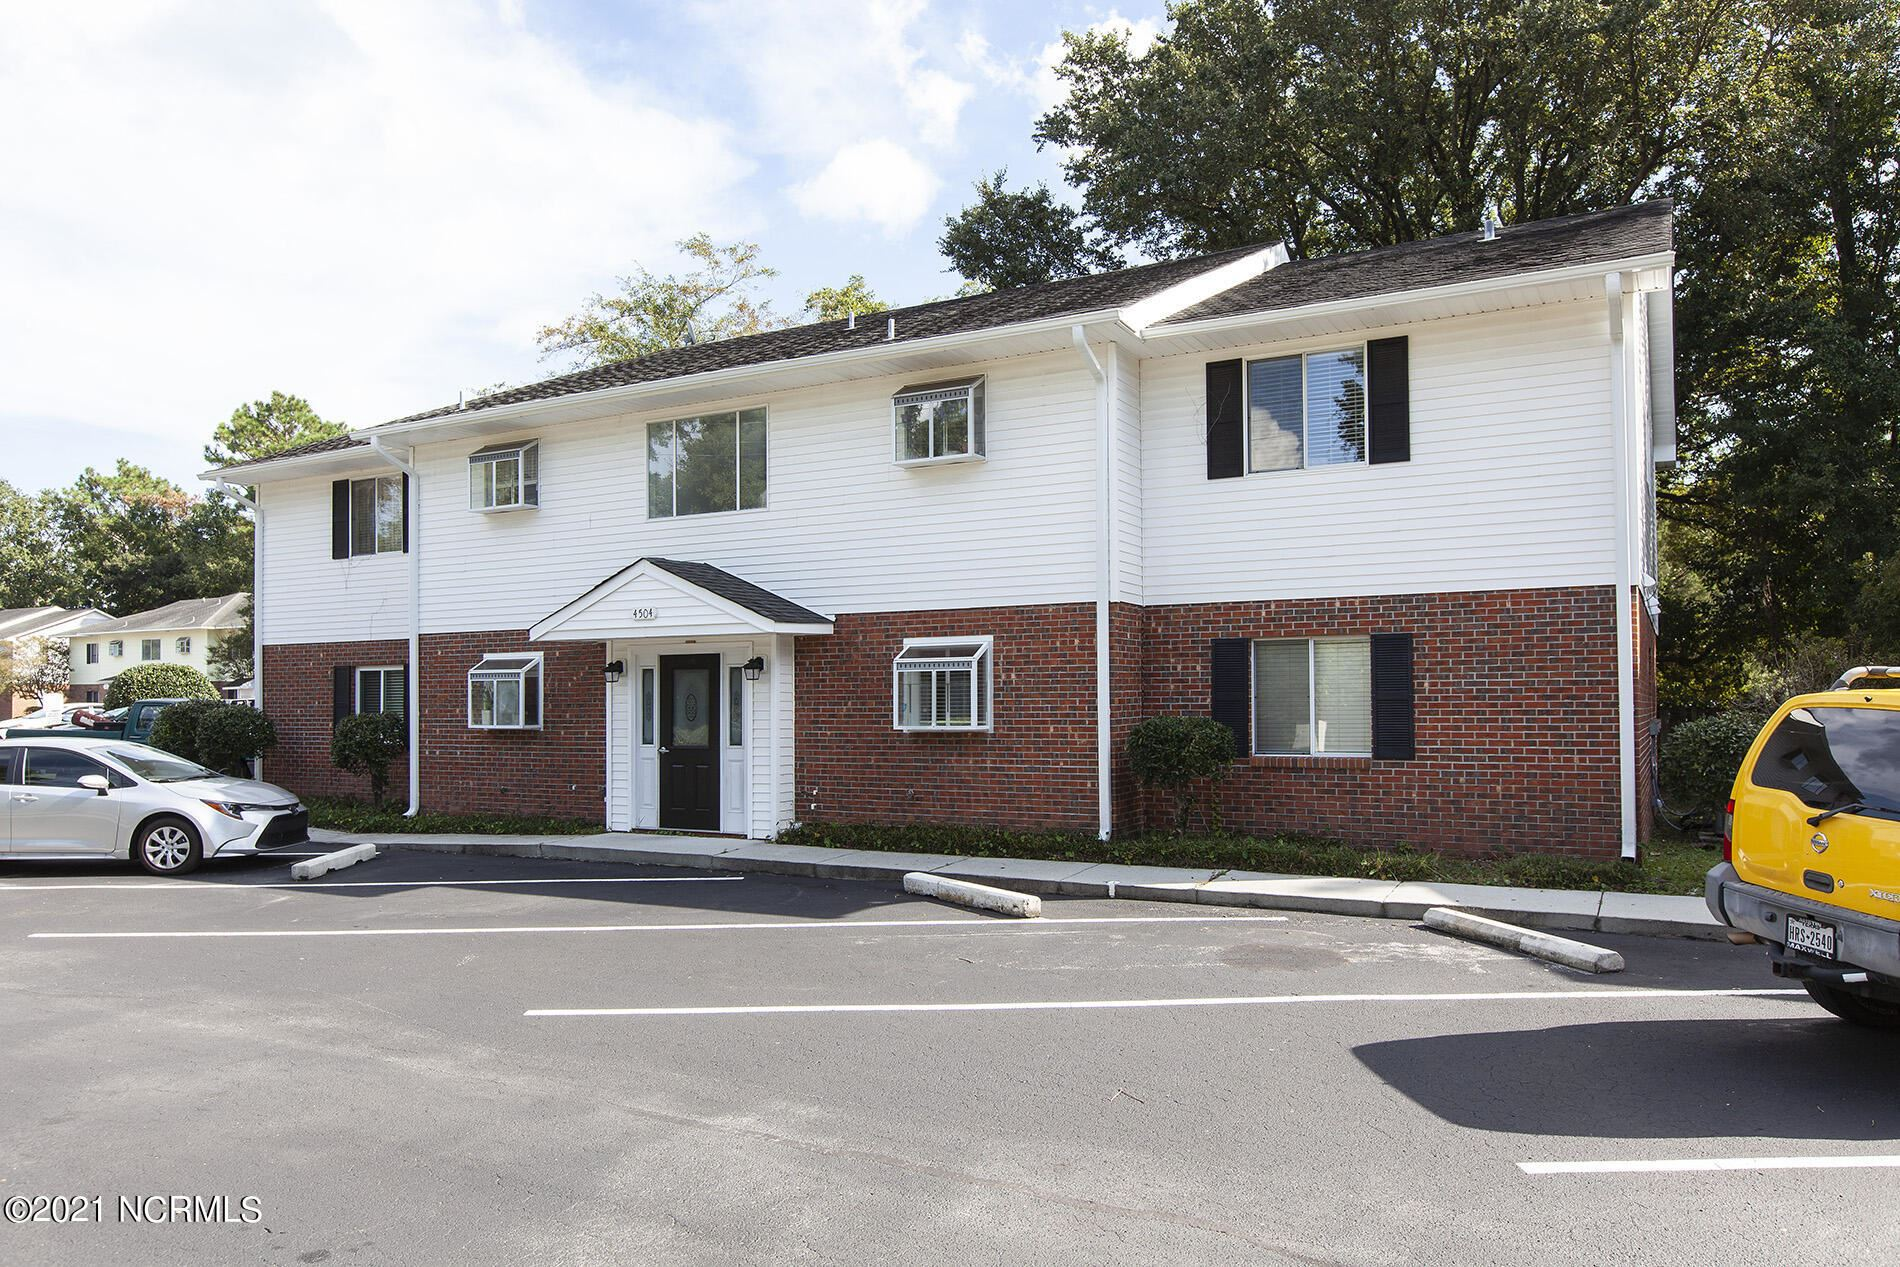 Photo of 4504 Kimberly Way #Apt 102, Wilmington, NC 28403 (MLS # 100293959)